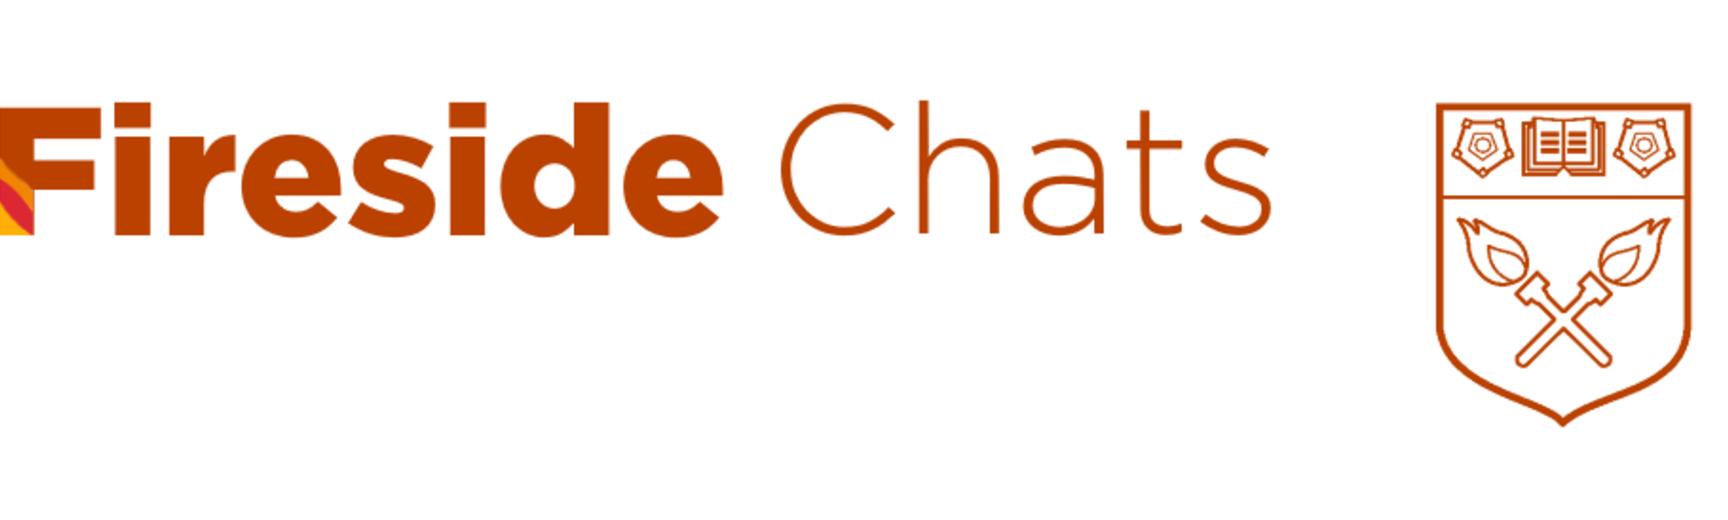 fireside chats hilary banner website version